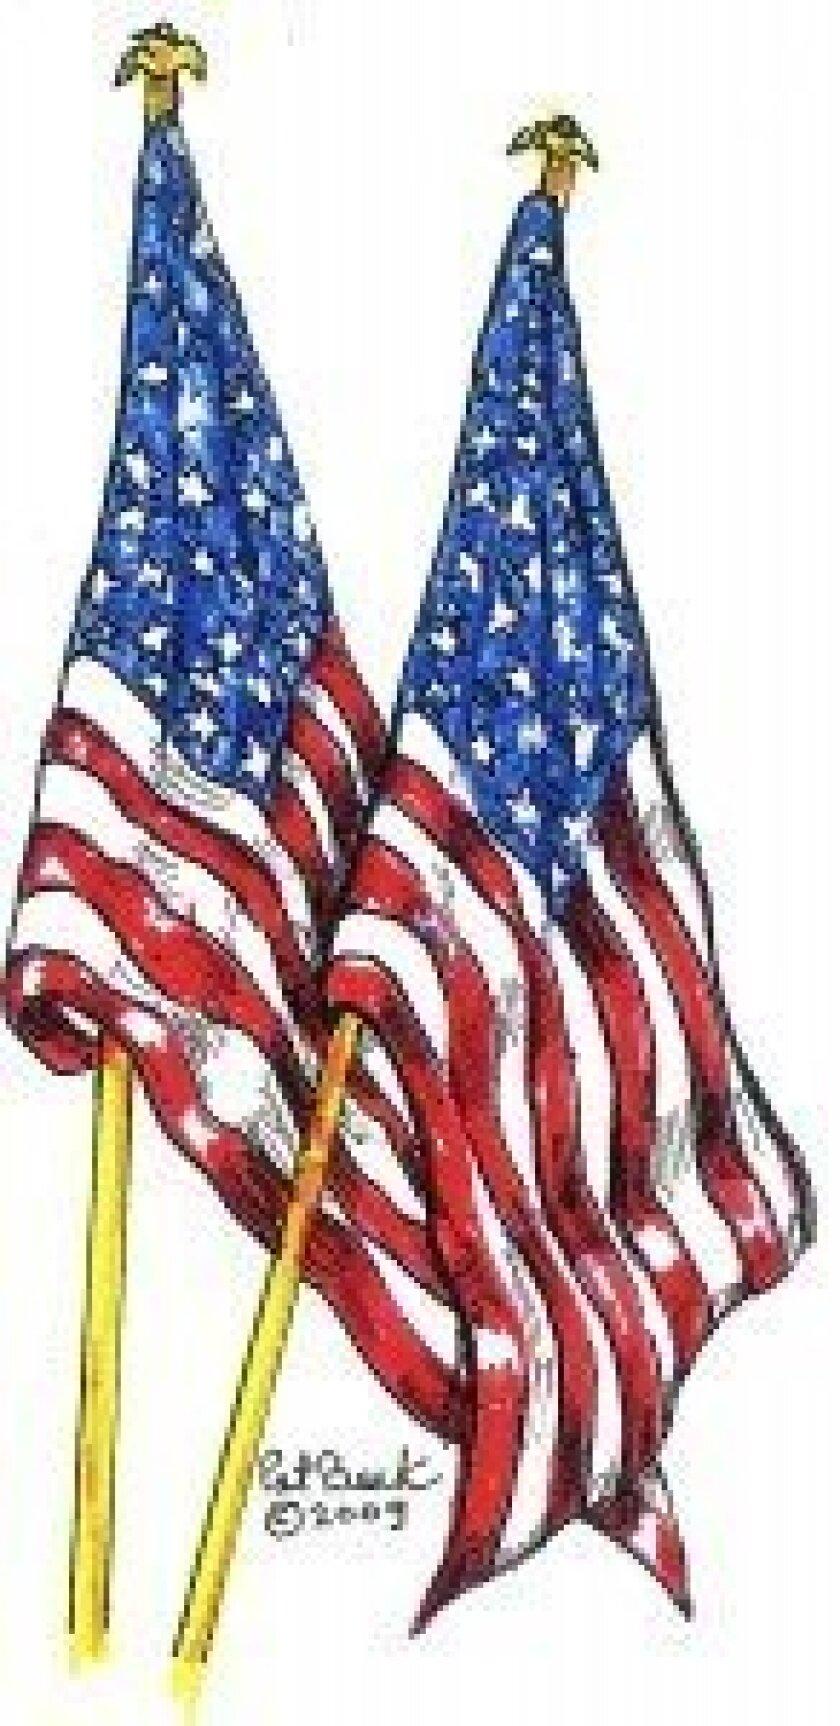 Pat_Beck's_Flags